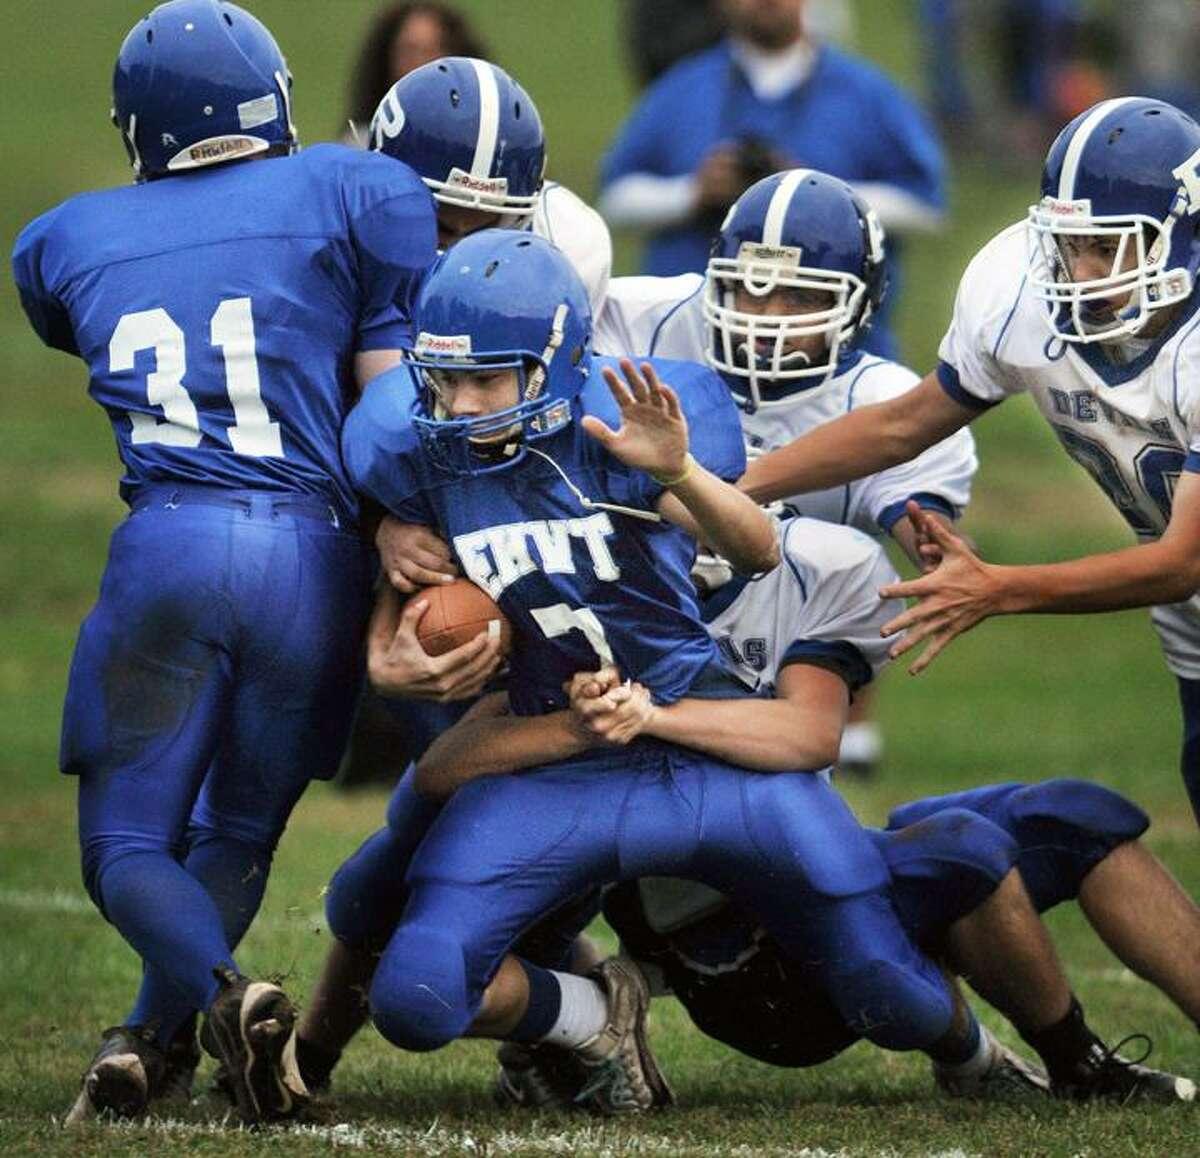 The Plainville Devils defense sacks East Hampton-Vinal quarterback Spencer Daly Monday at Vinal Tech High School. (Catherine Avalone